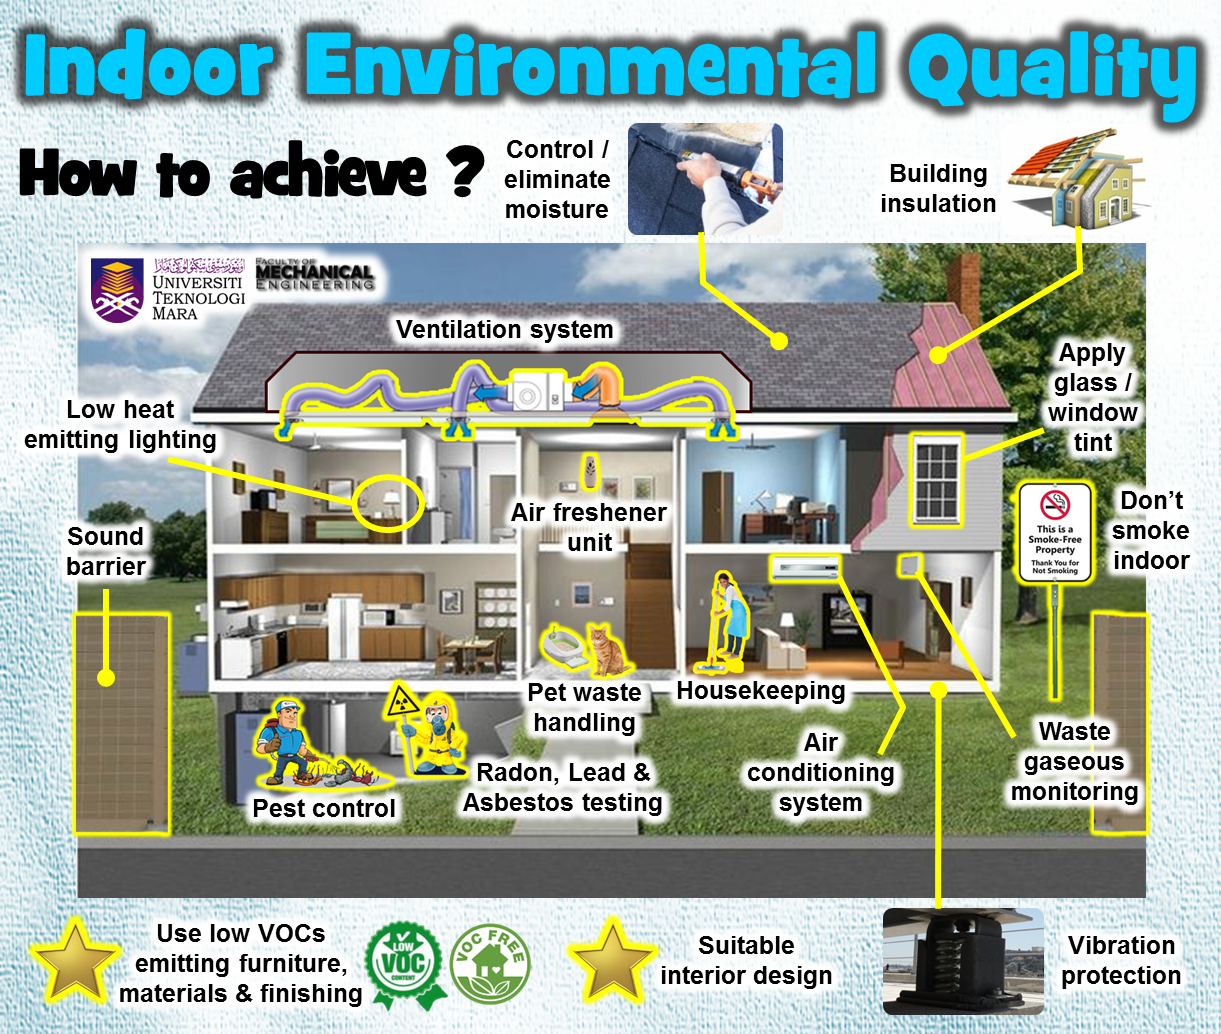 Towards Green Building Indoor Environmental Quality